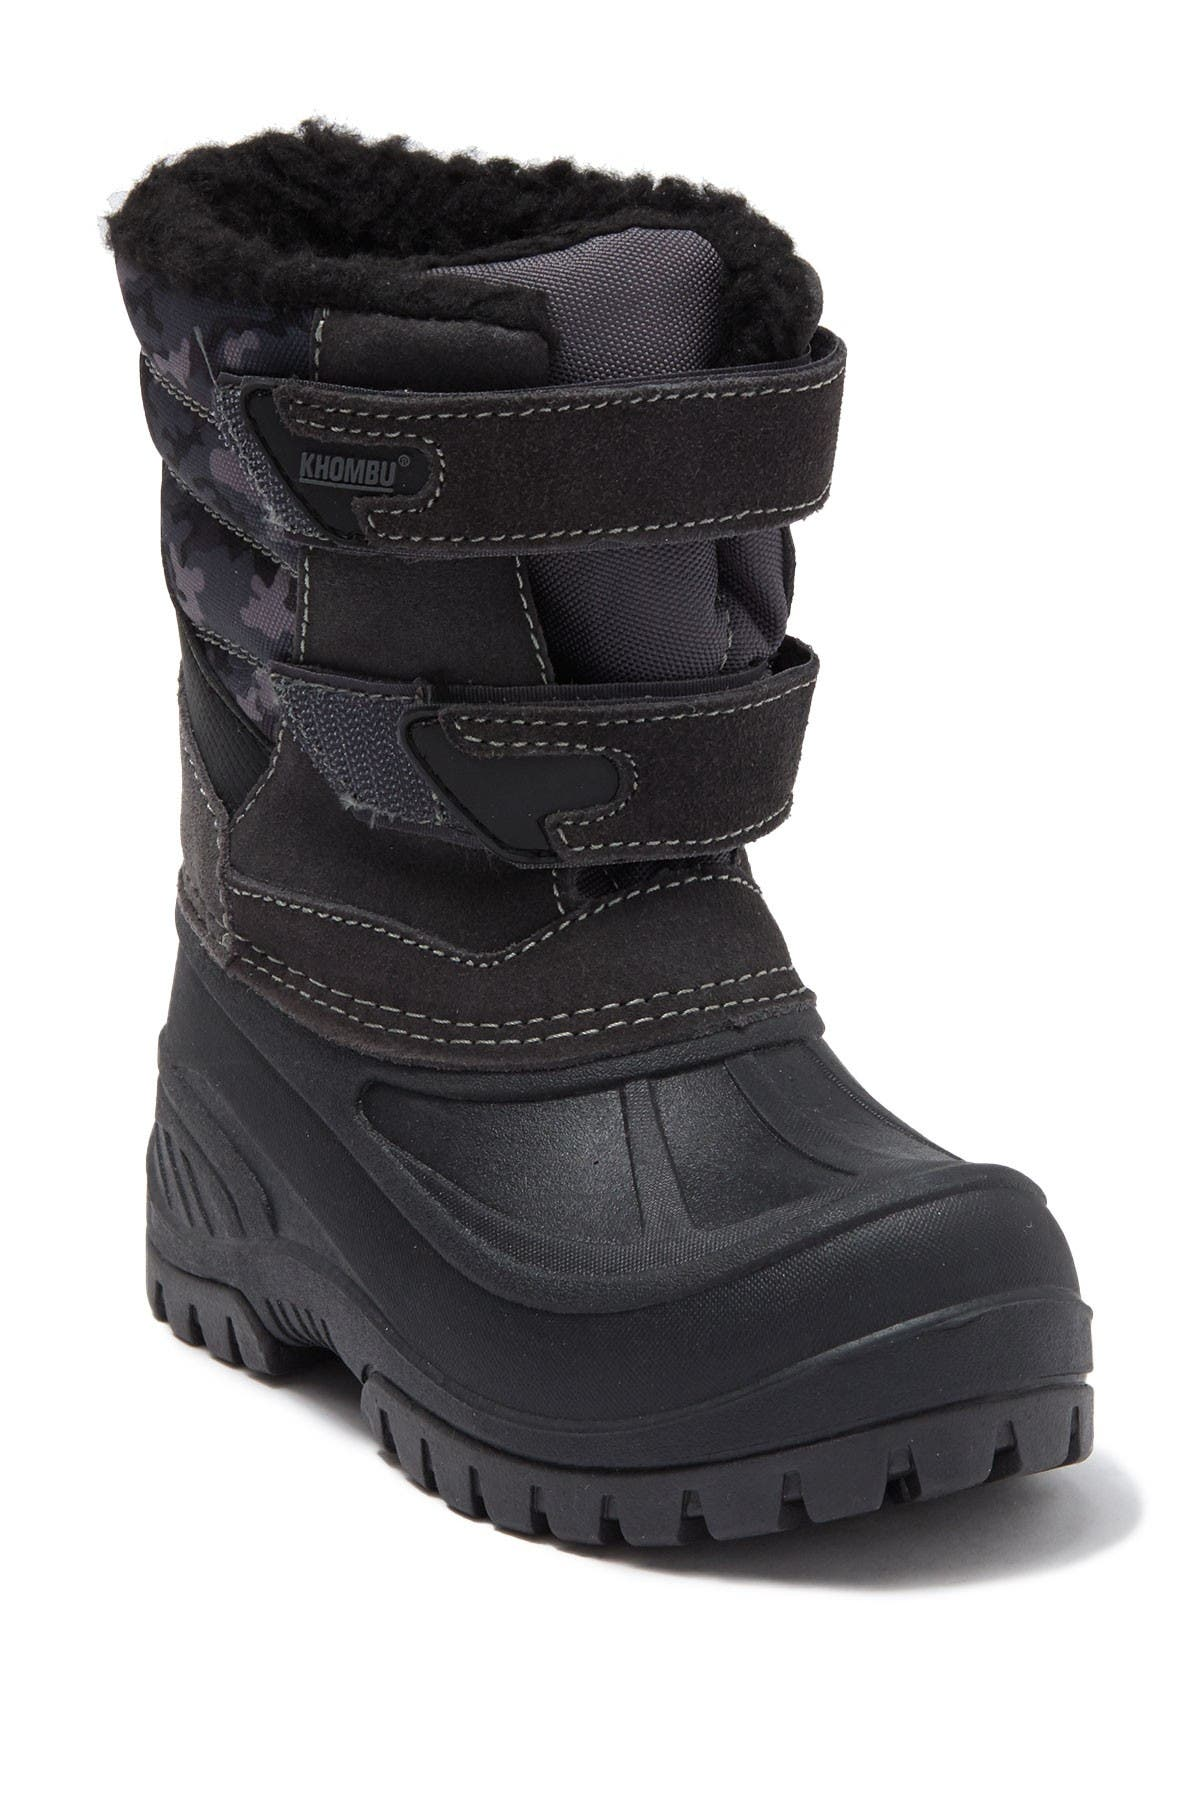 Image of Khombu Snowbank Faux Fur Lined Boot